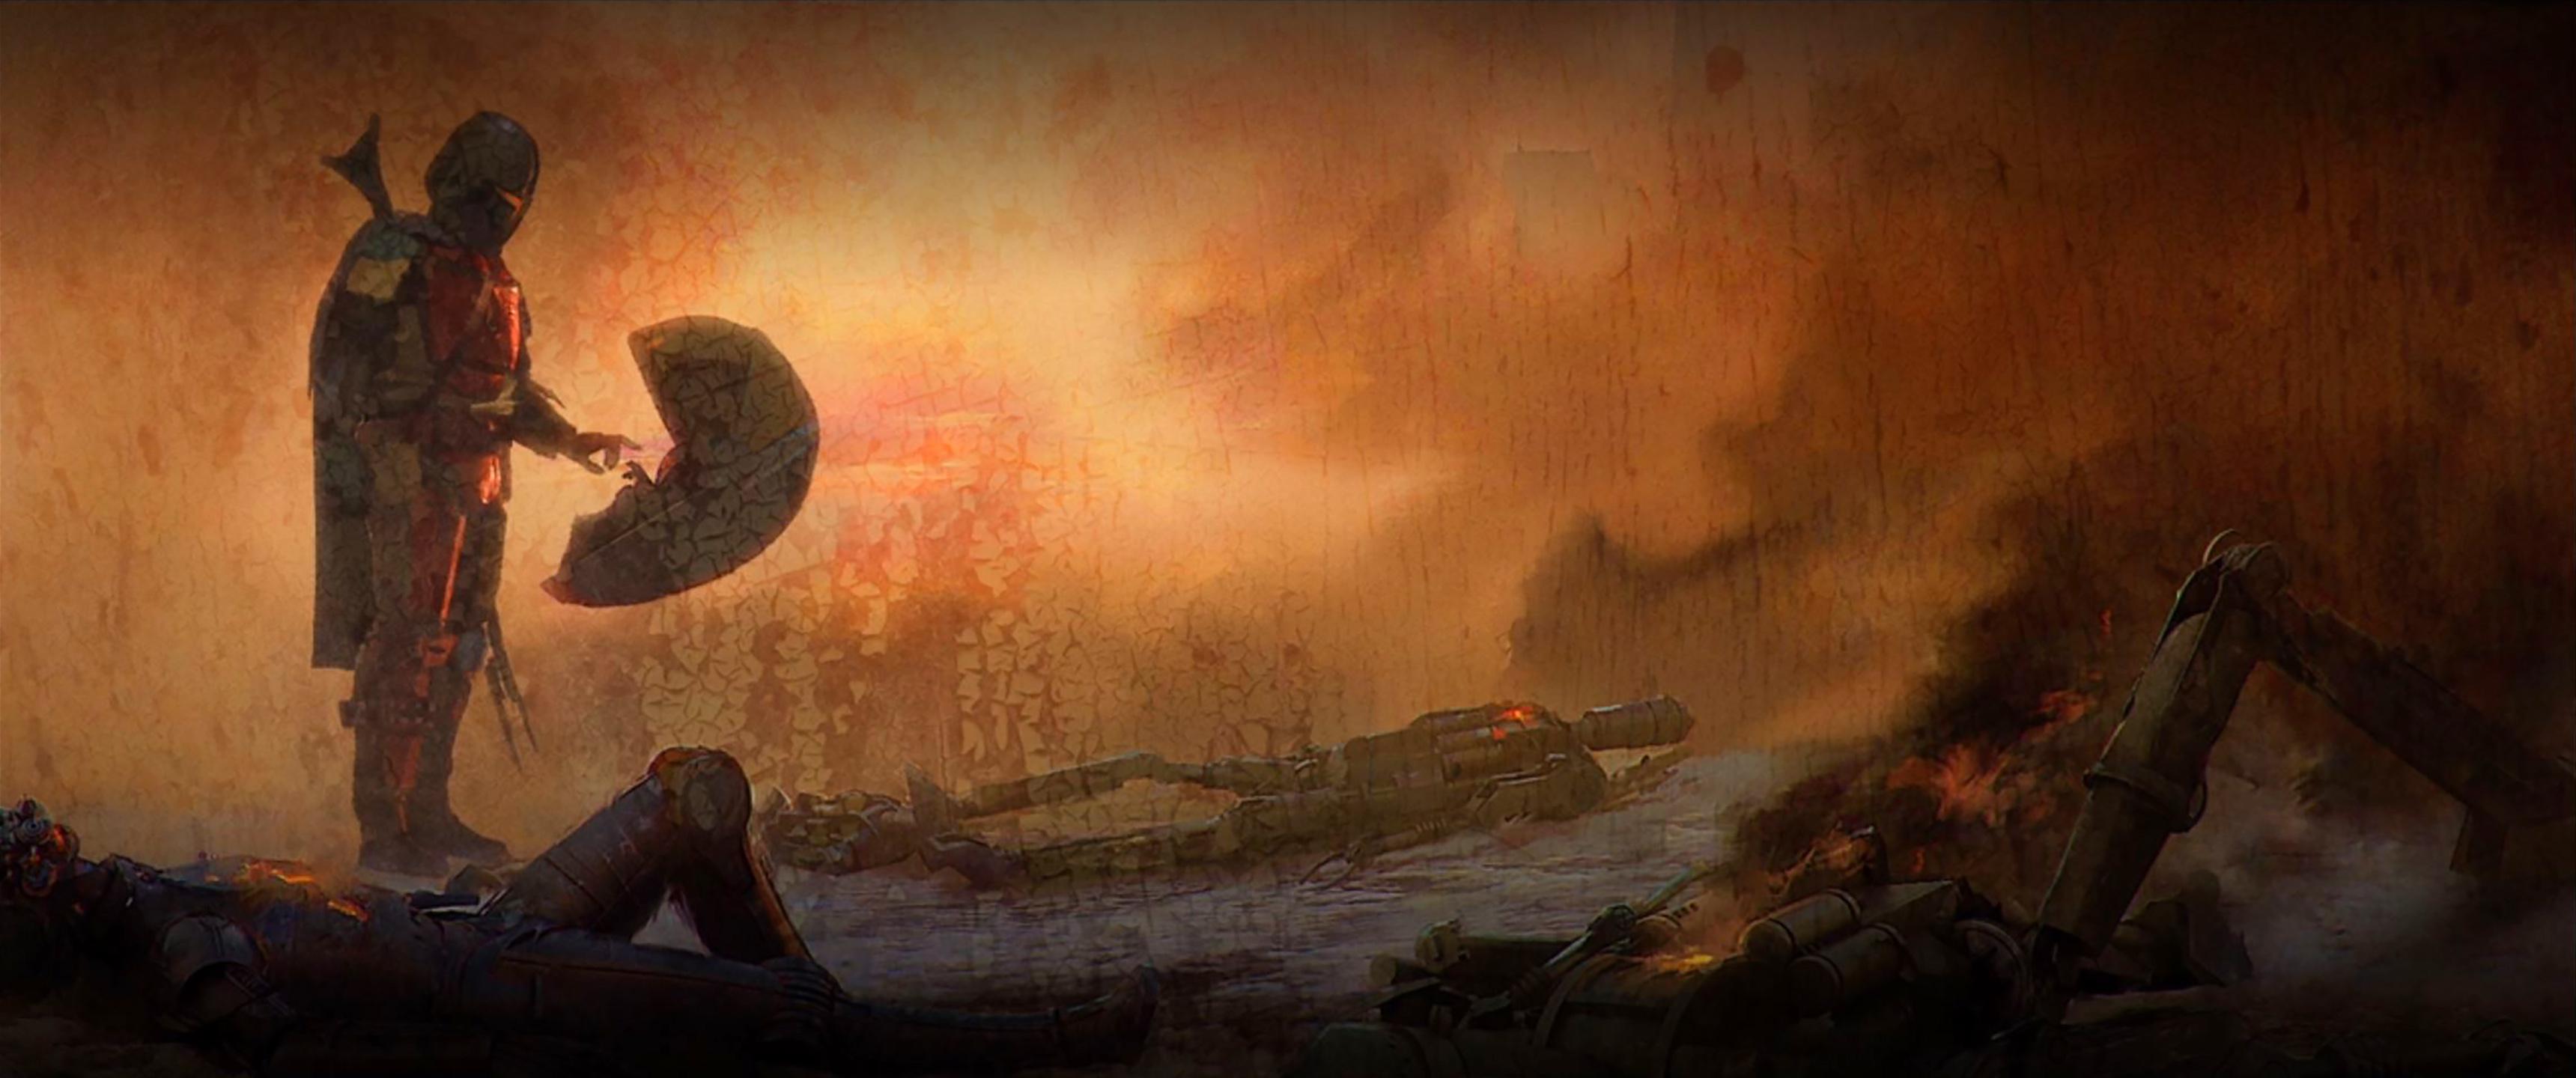 Star Wars Mandalorian Wallpaper